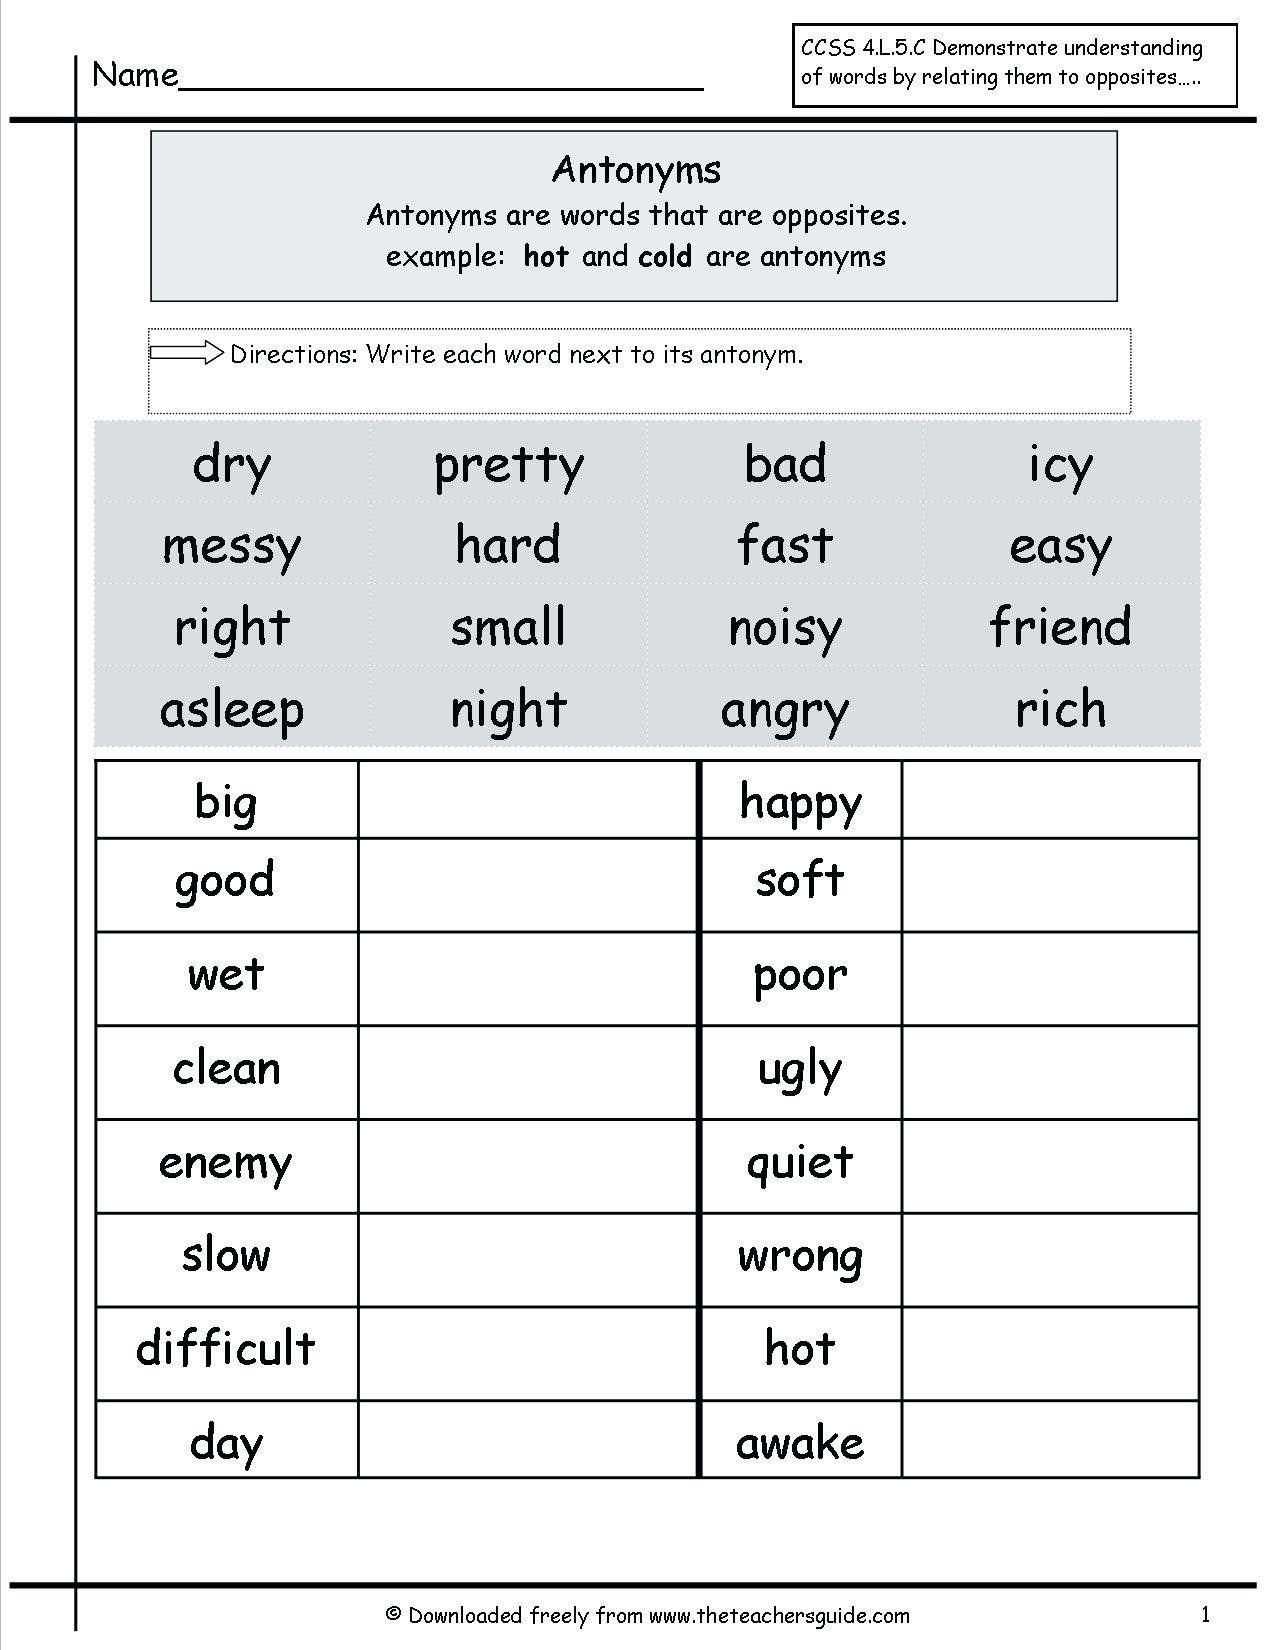 Grammar Worksheet 4th Grade Statistics Worksheet For 4th